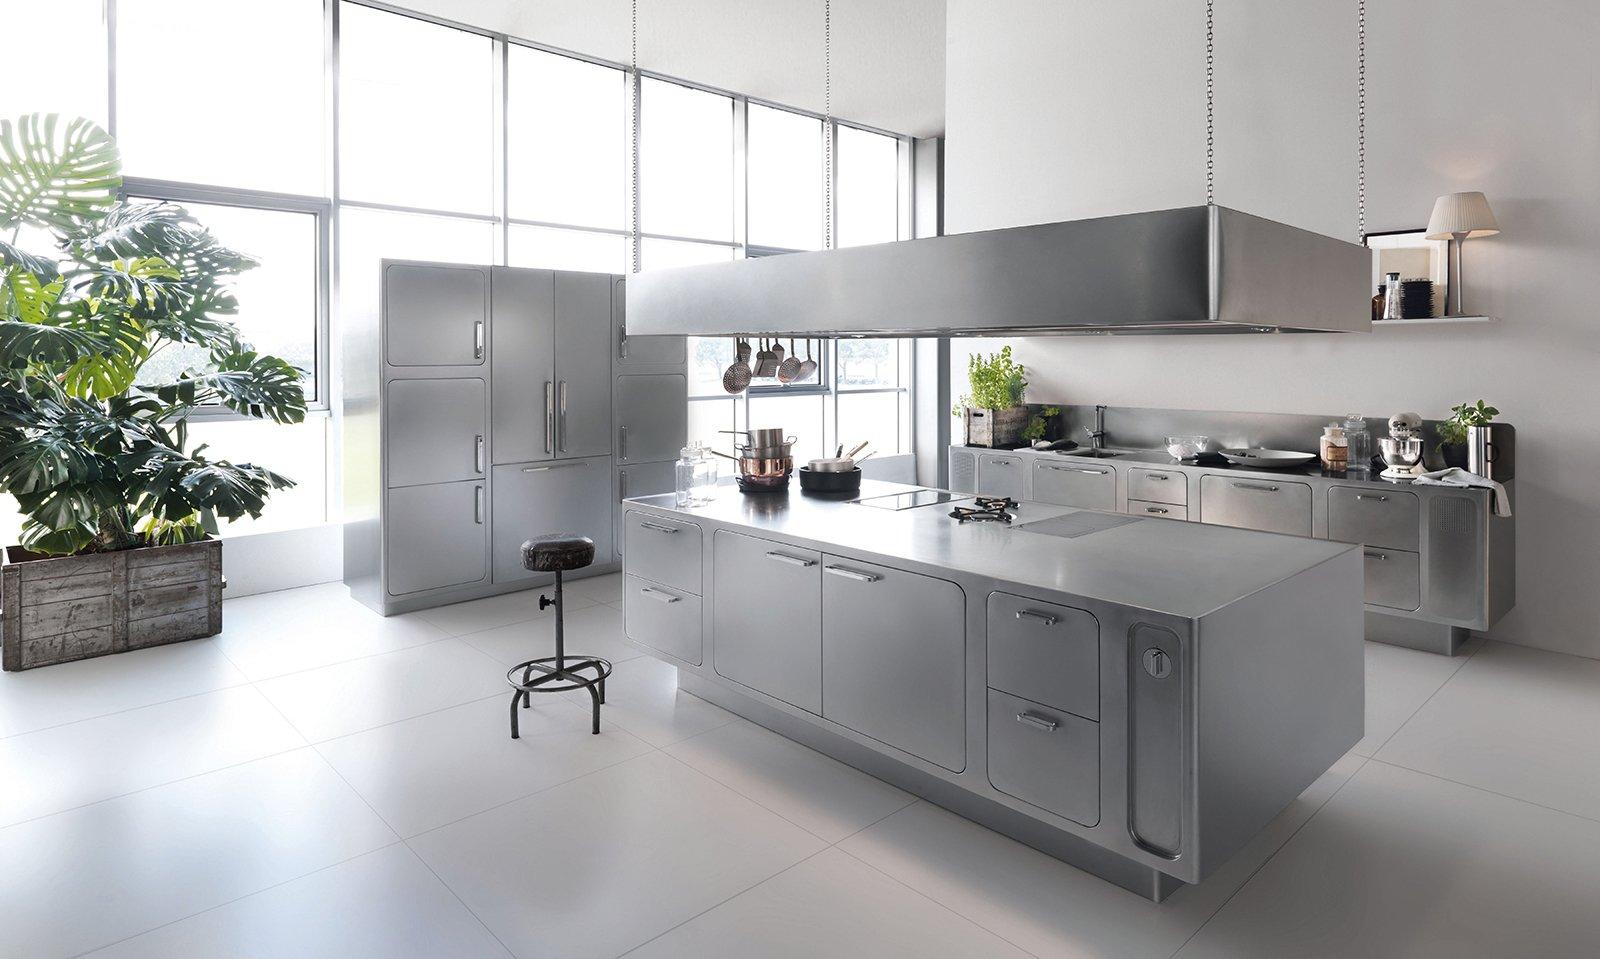 Cucine industrial style cose di casa for Planner per cucine